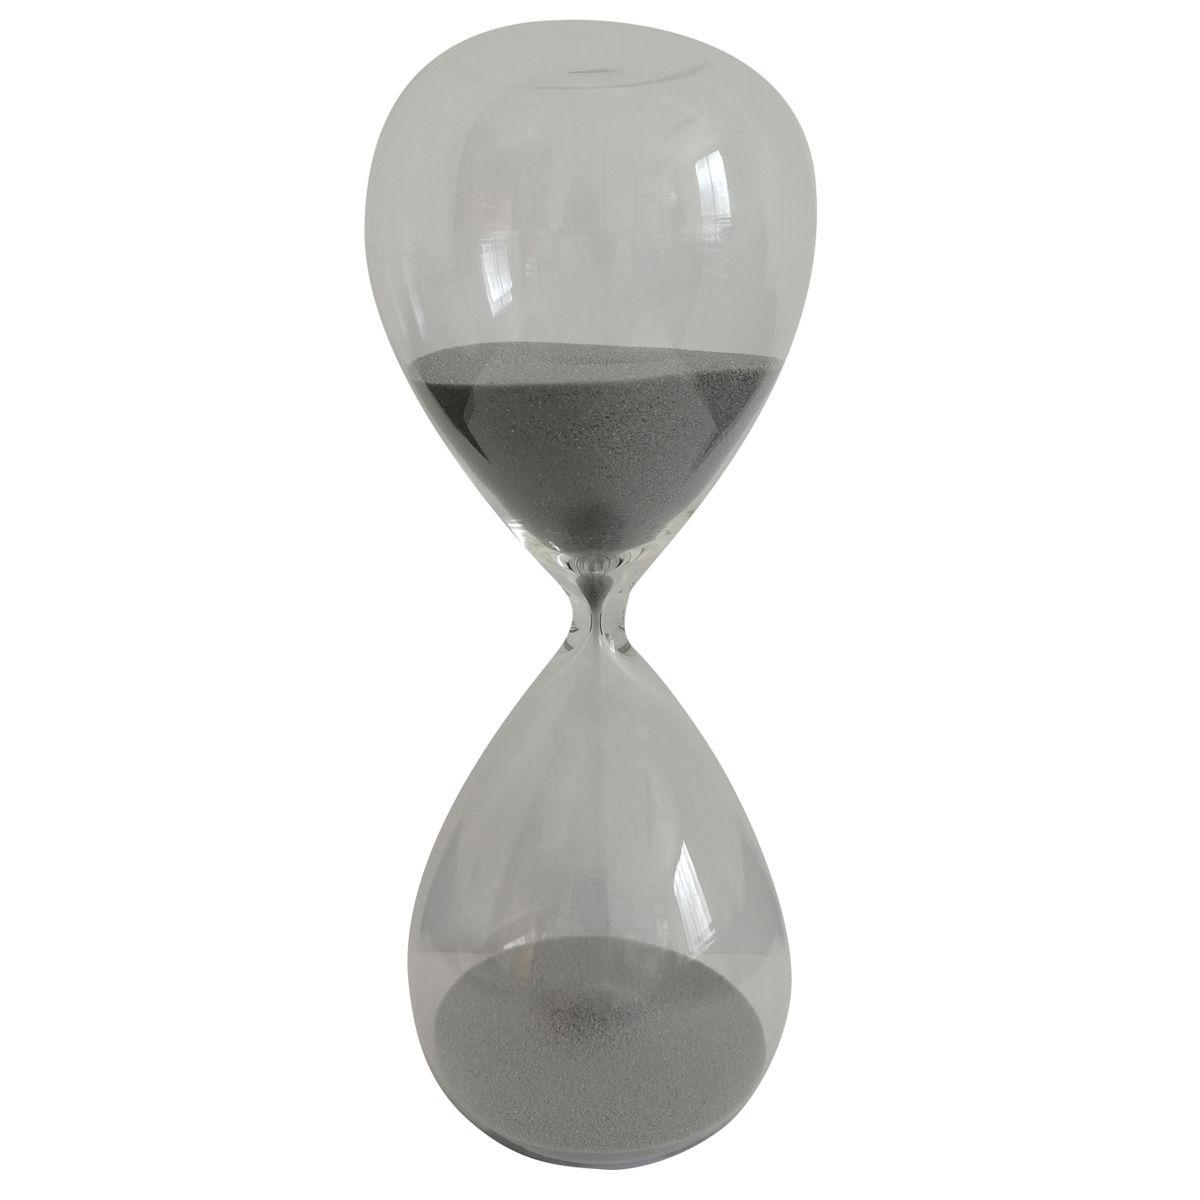 Ampulheta Decorativa de Vidro Clear Glass Prata 10 Minutos